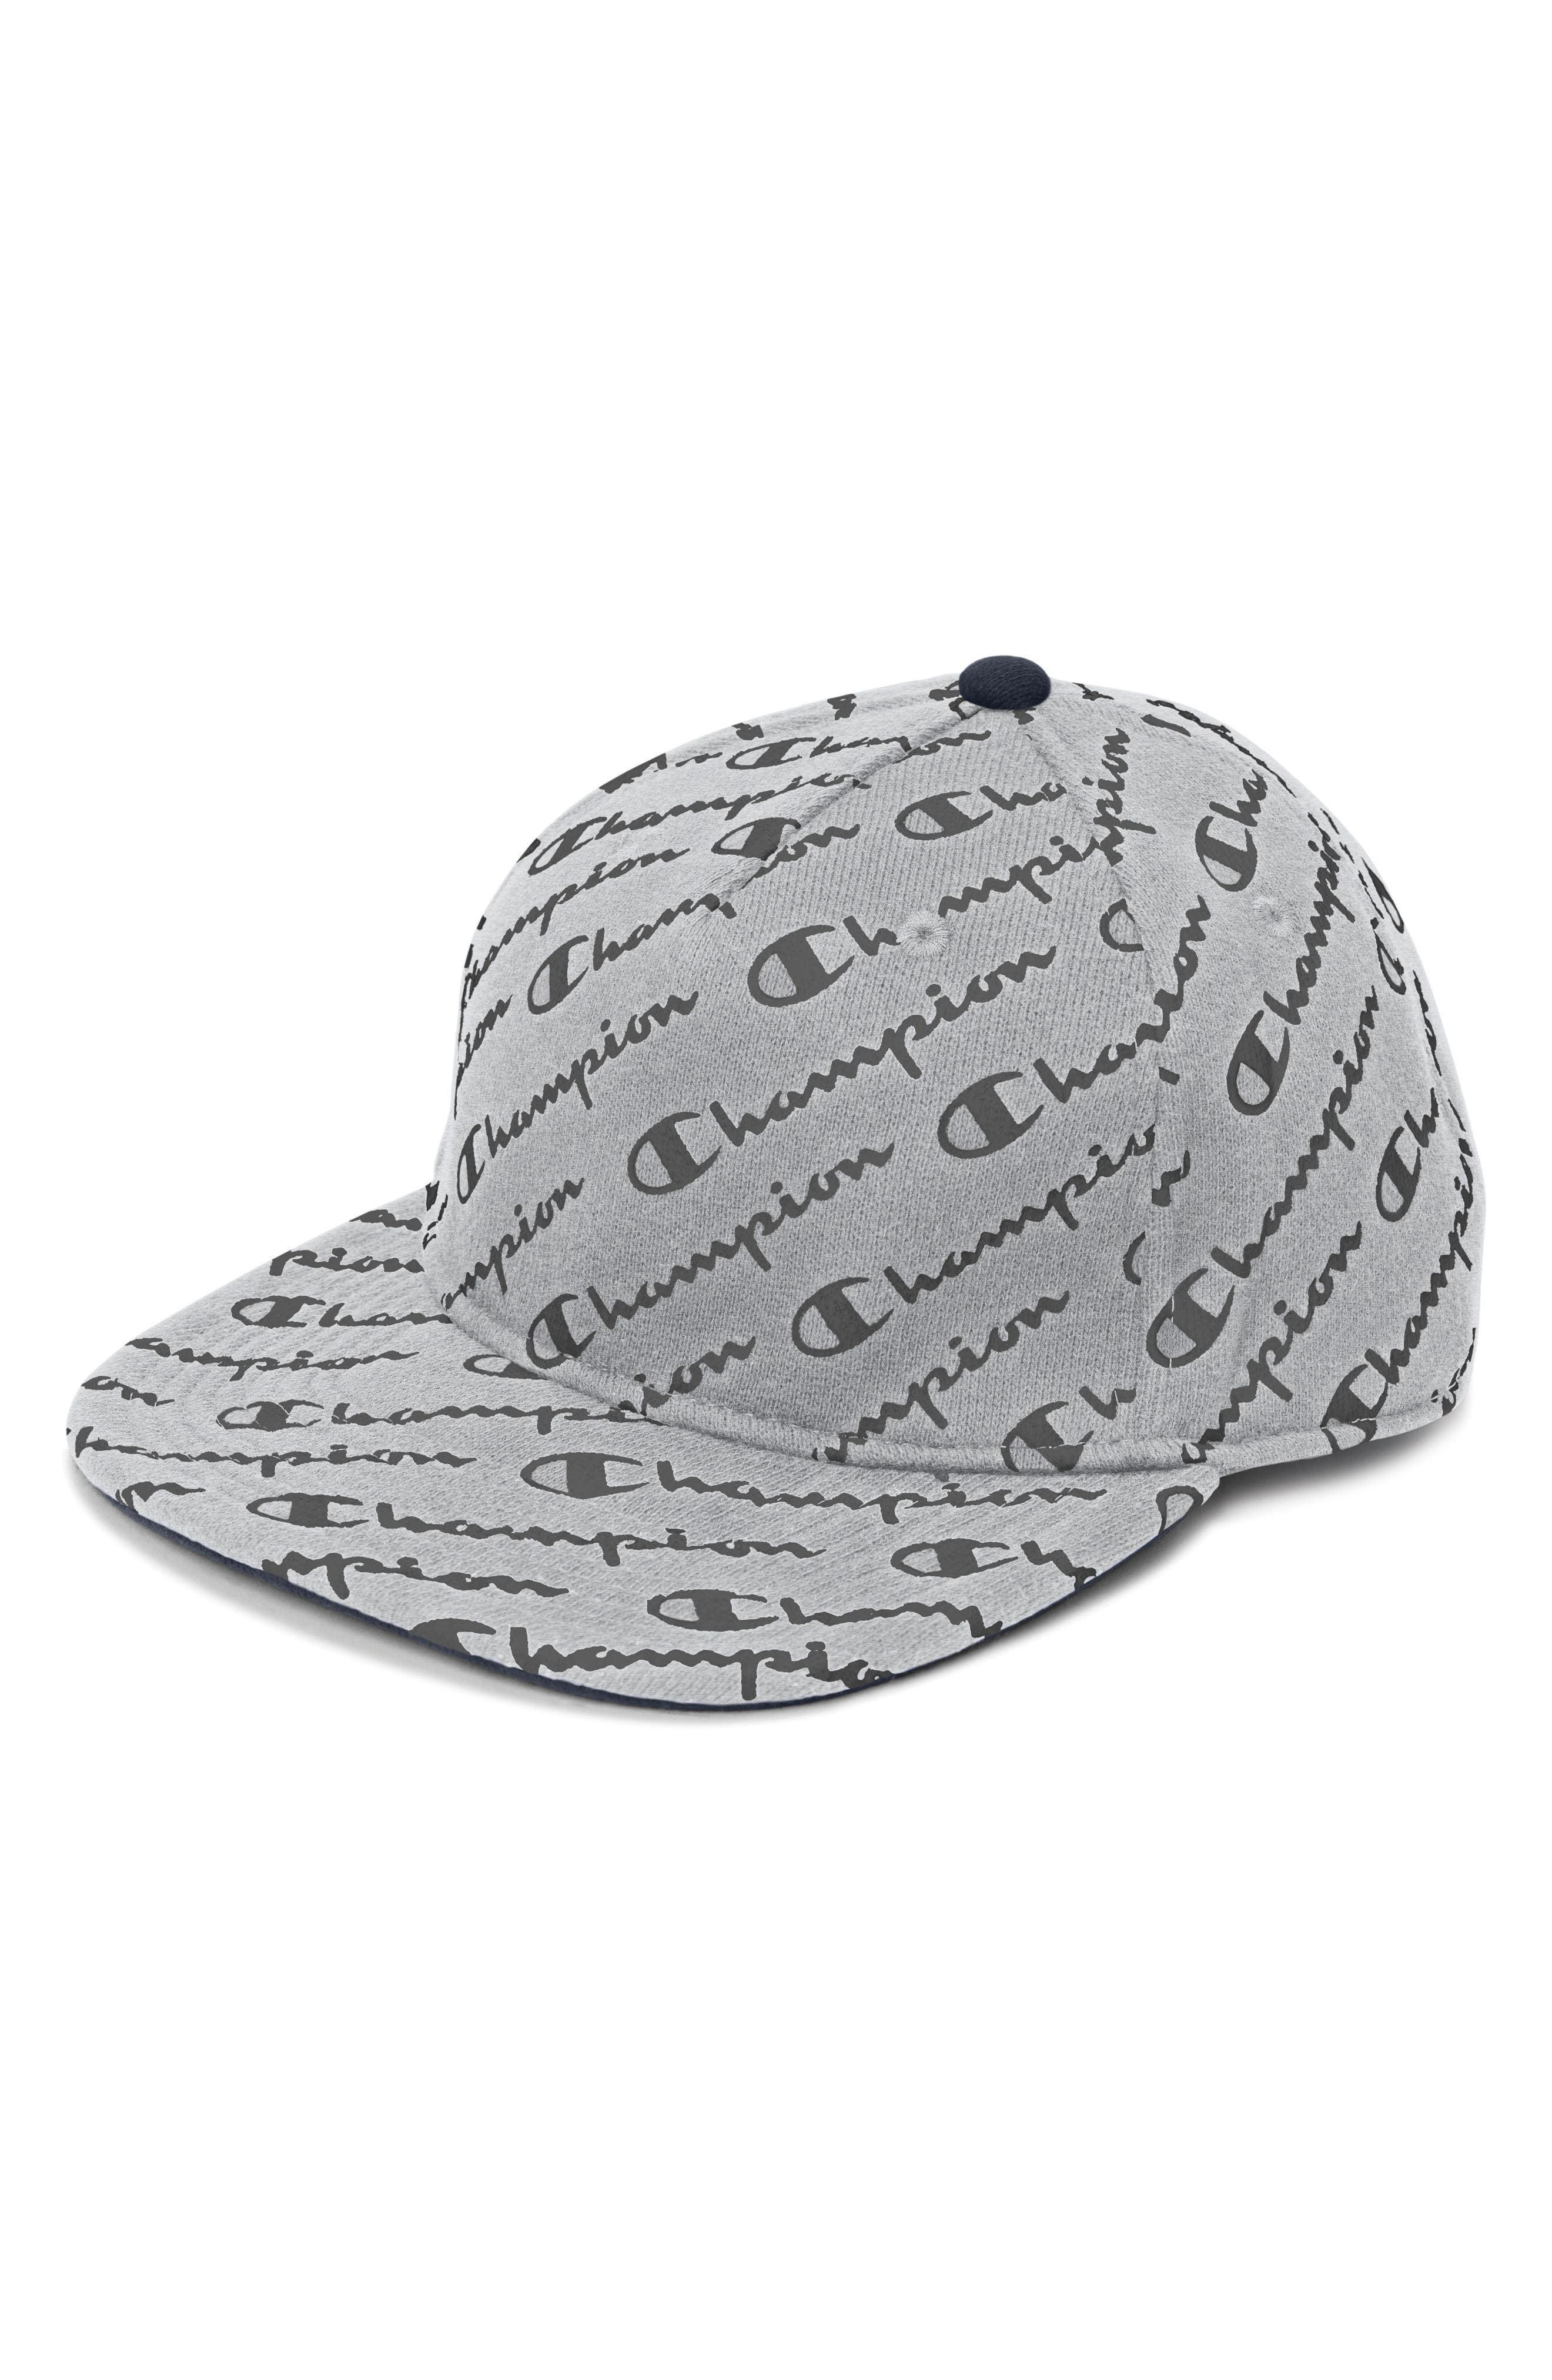 a6d940aed4cf6f ... wholesale champion reverse weave logo print ball cap nordstrom a32fe  ed7e4